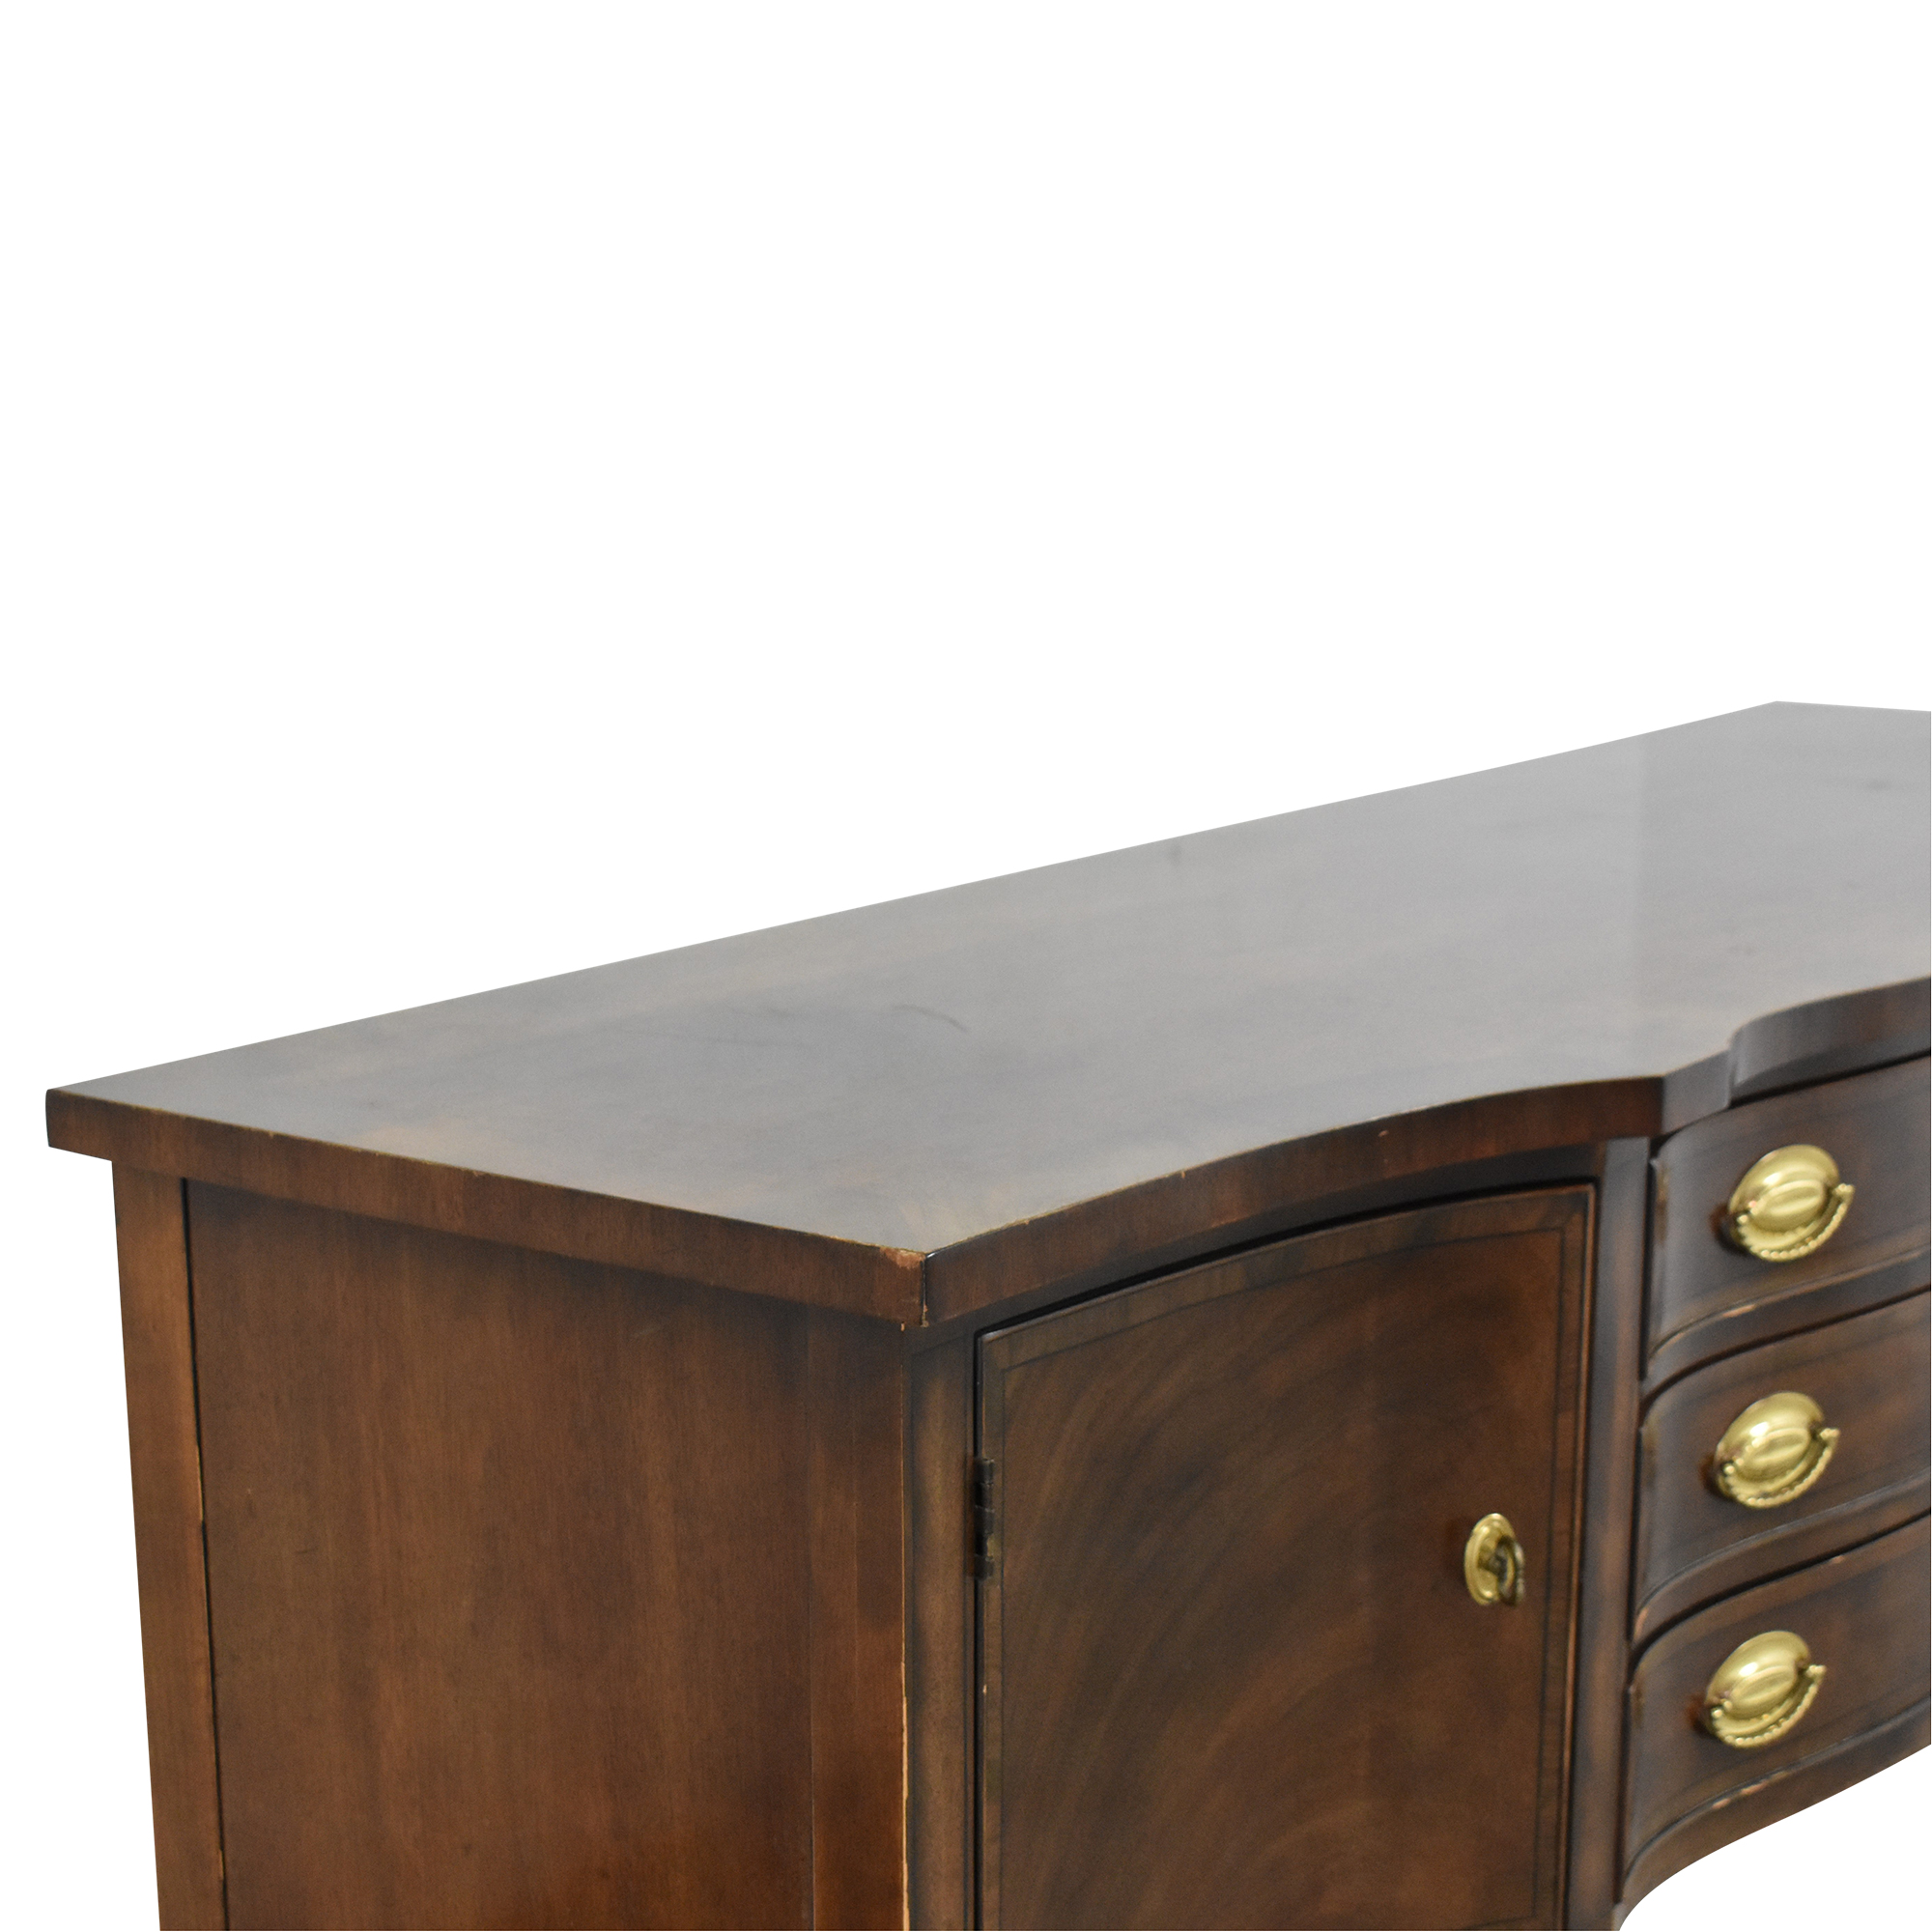 shop Henredon Furniture Henredon Furniture Rittenhouse Square Sideboard online